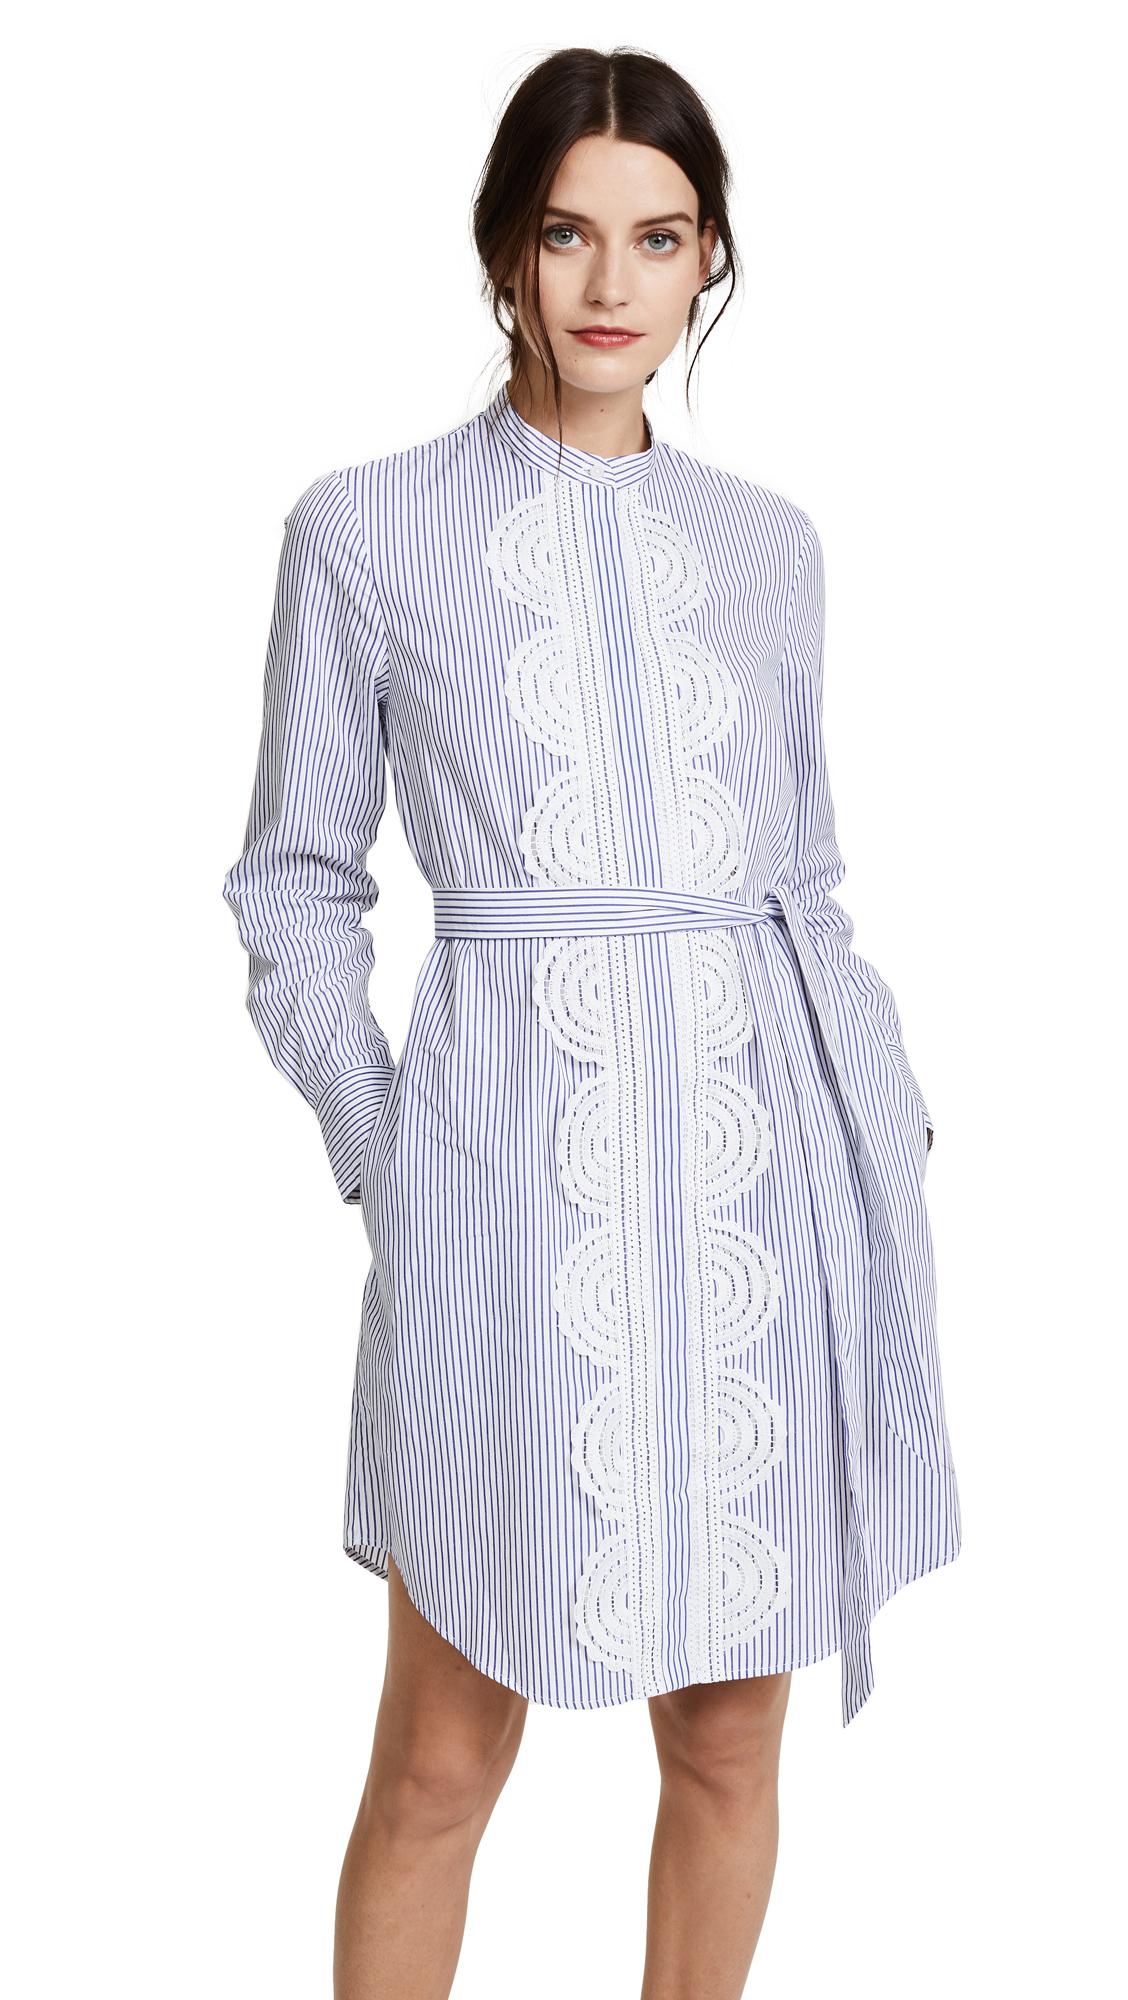 Lover Arc Shirtdress - Stripe